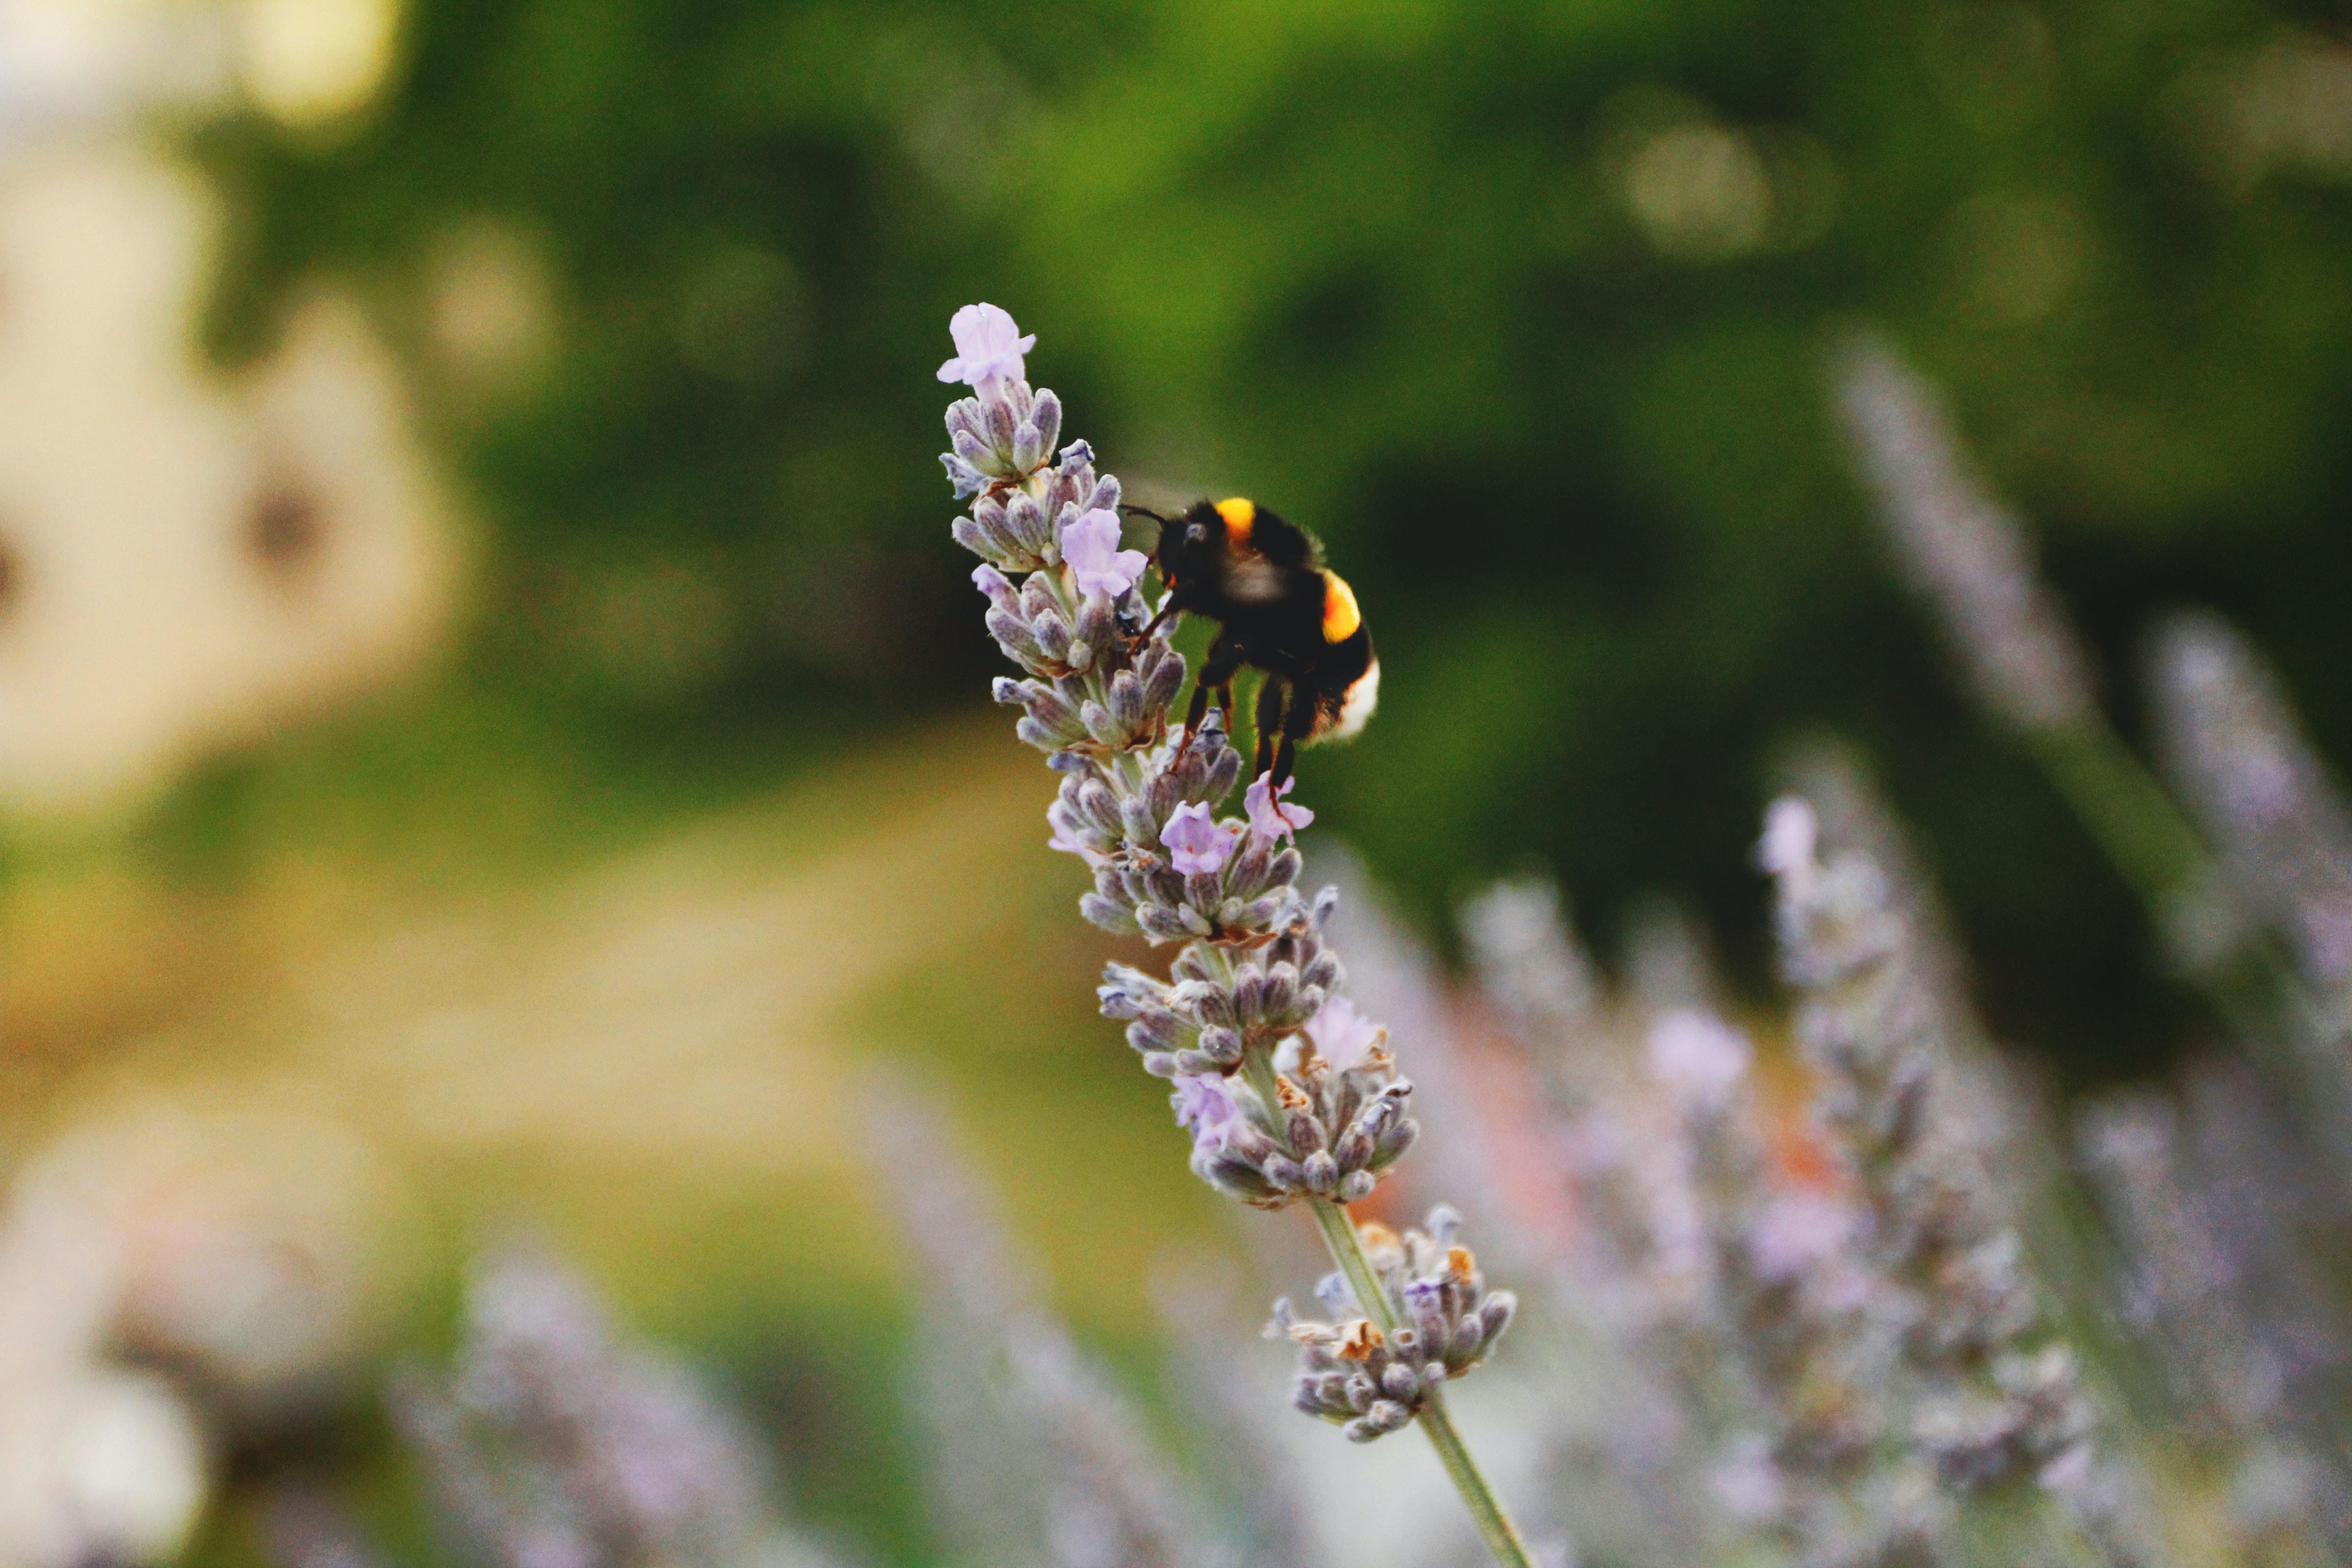 black and yellow bumblebee on purple flower